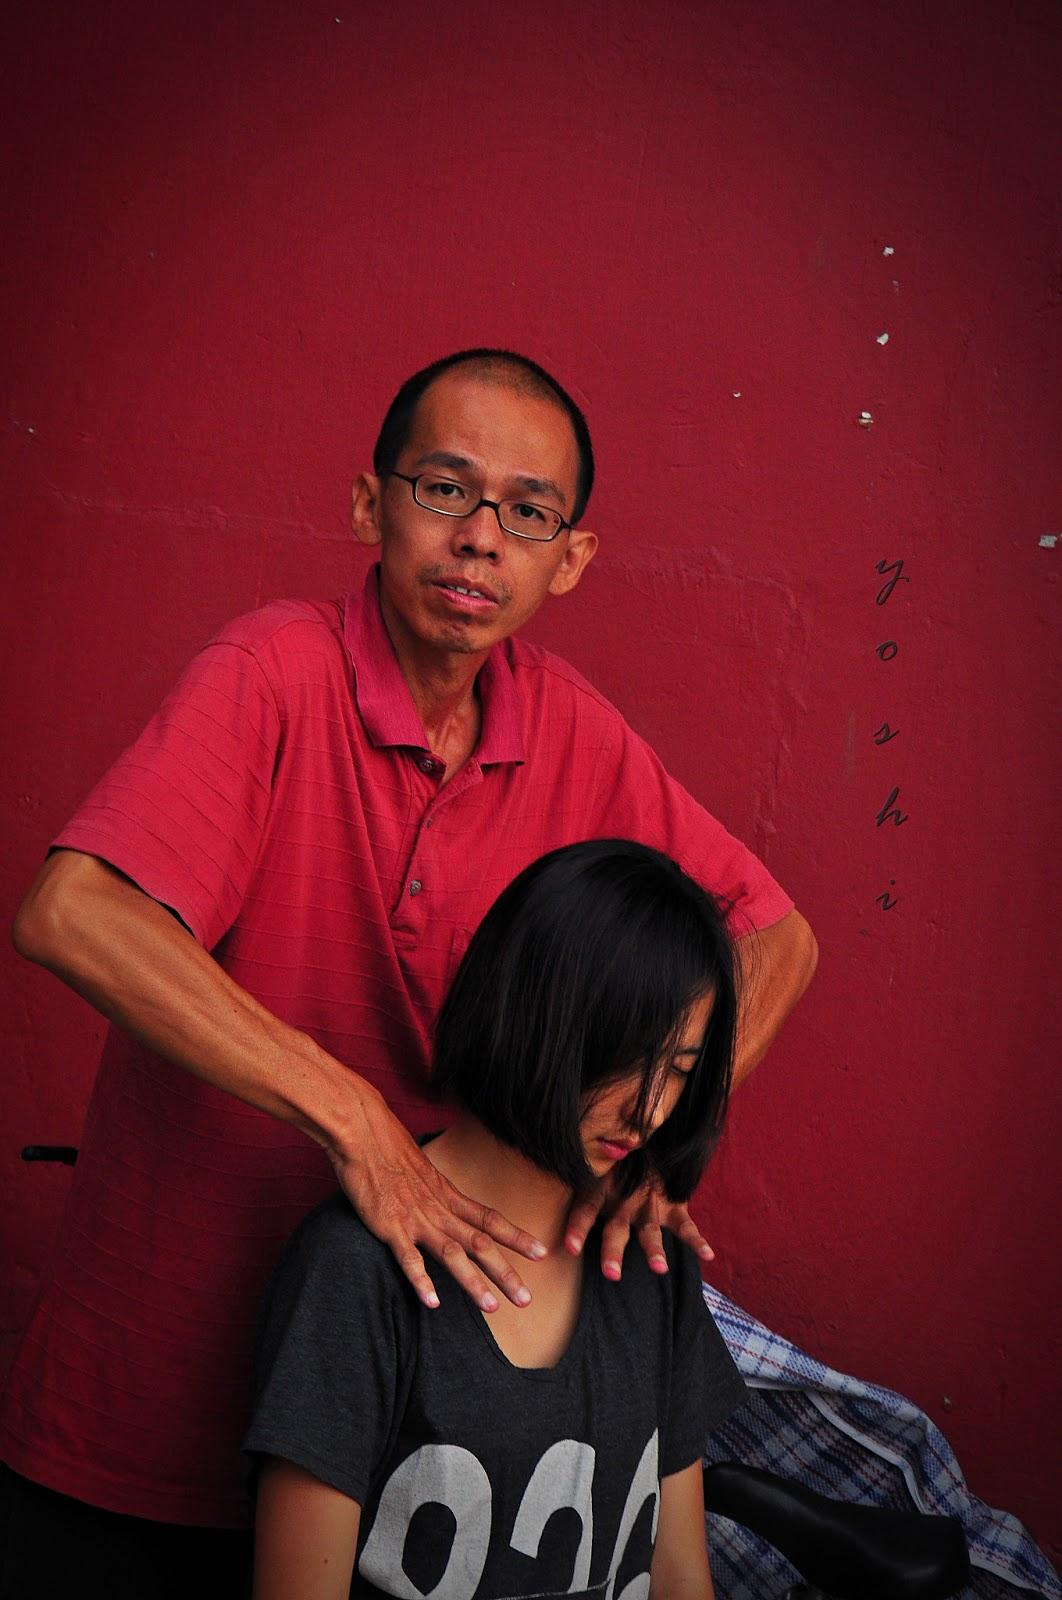 malacca single guys Dating melaka female, adult personals online sex dating in melaka 1,500,00 daily active members.